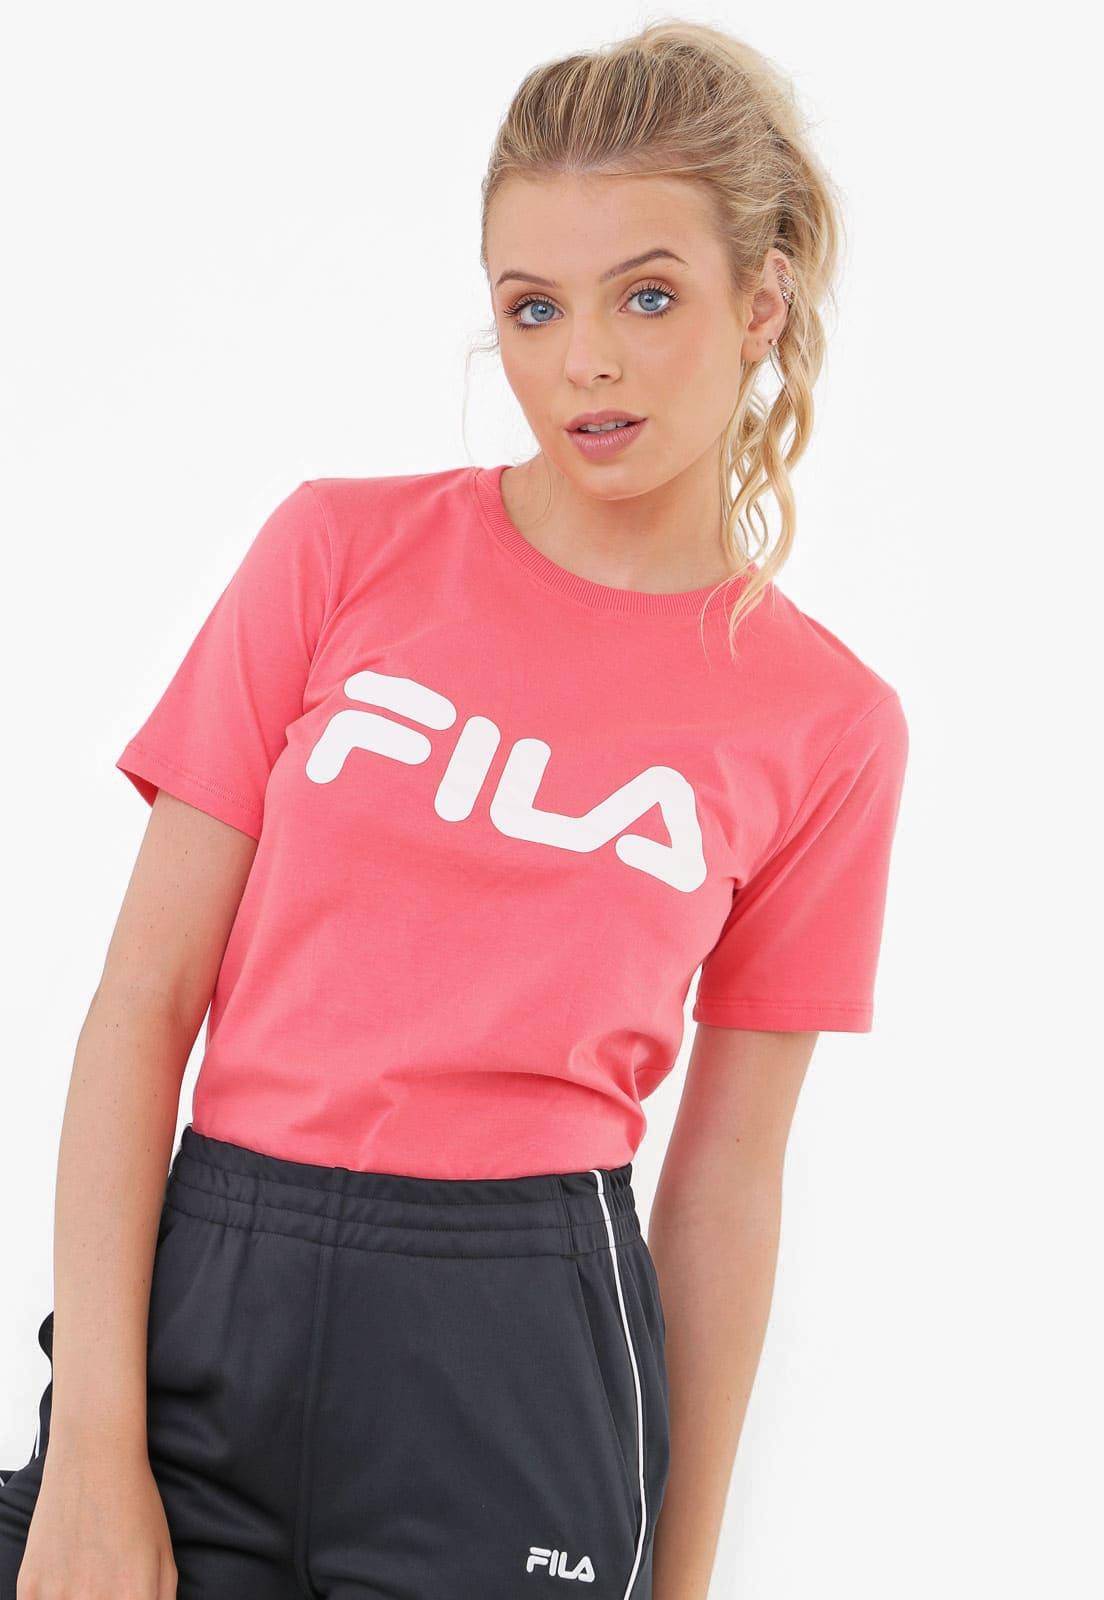 Camiseta Feminina Basic Letter Fila Rosa